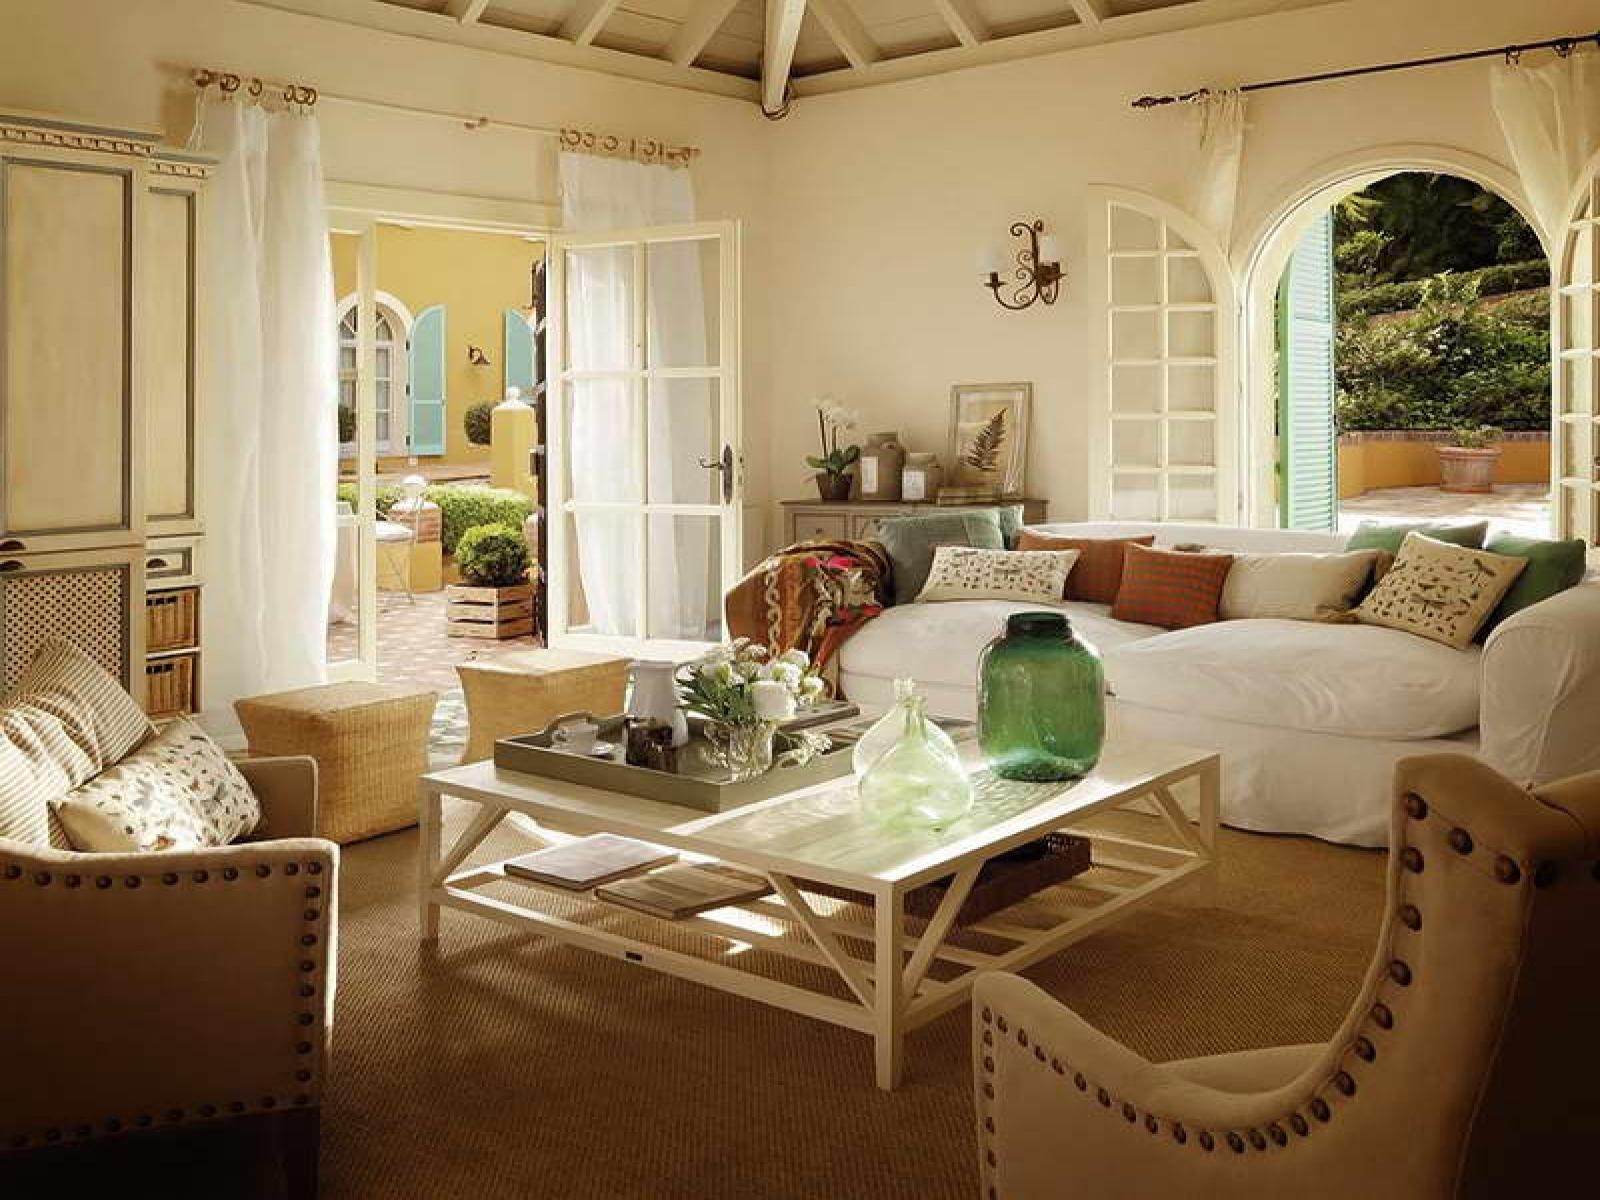 cottage-style-interior-design-beach-cottage-design-ideas-with-carpet-flooring